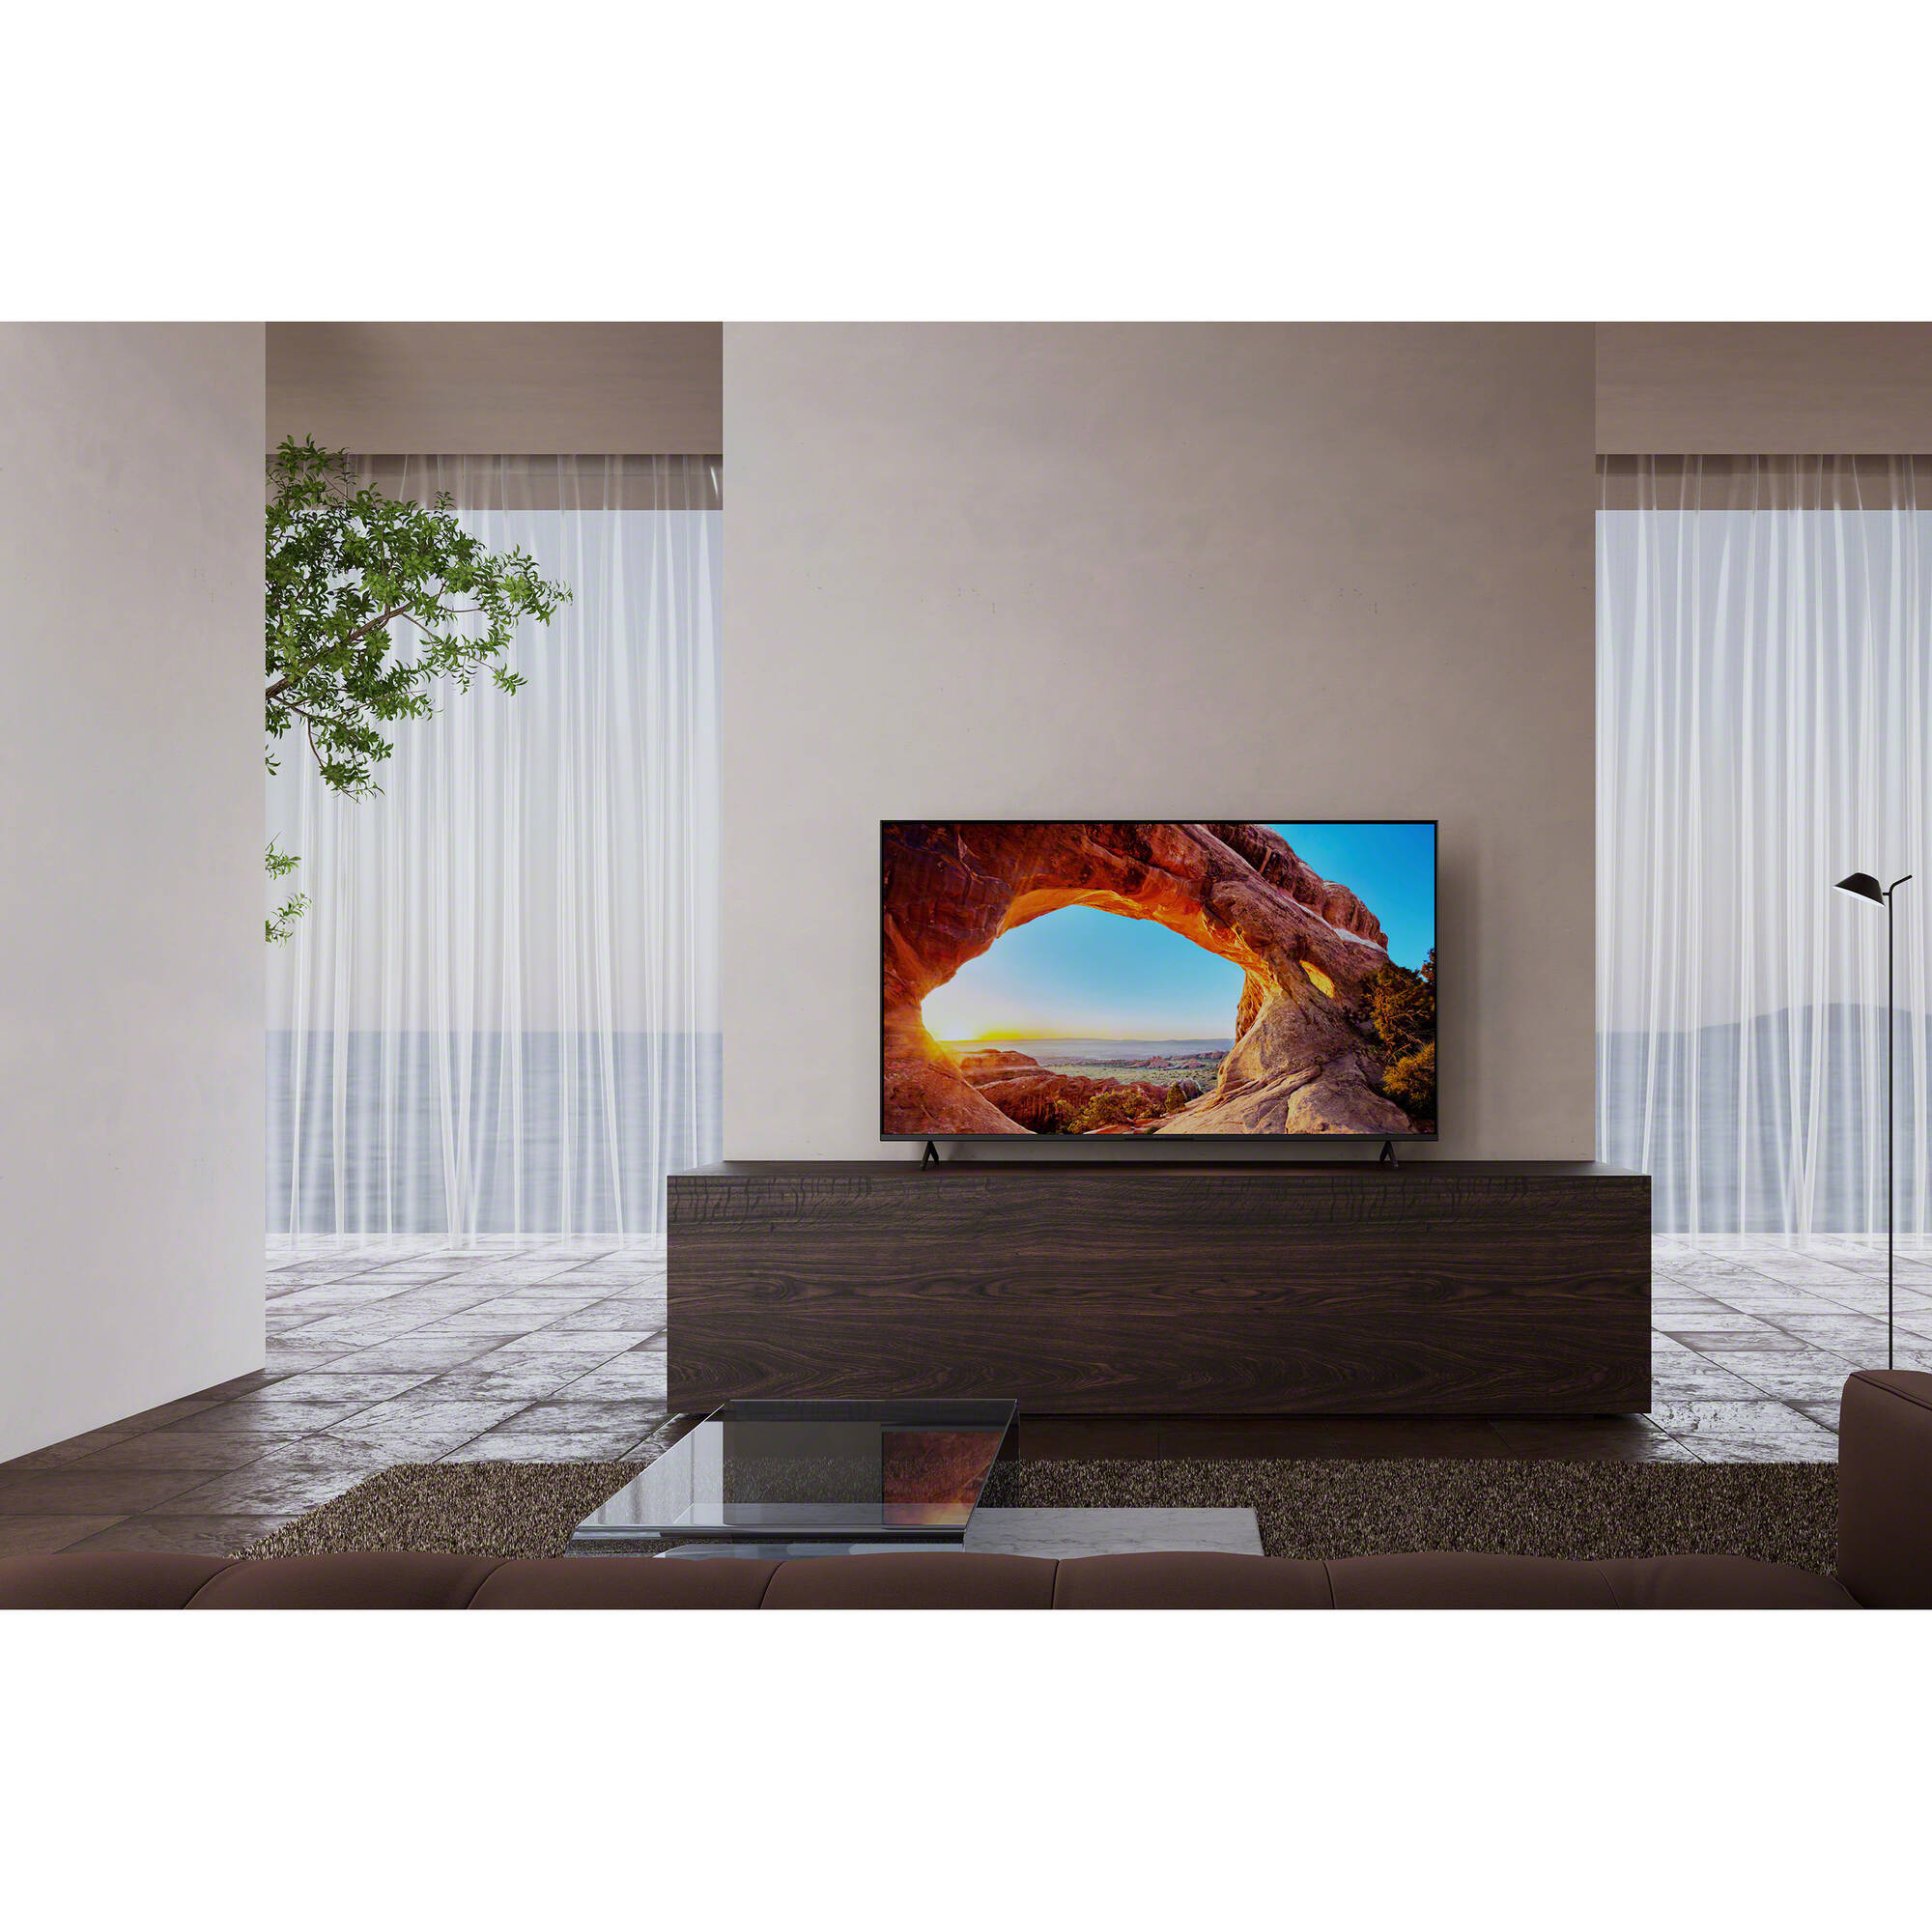 Телевизор KD-65X85TJ купить в интернет-магазине Sony Centre